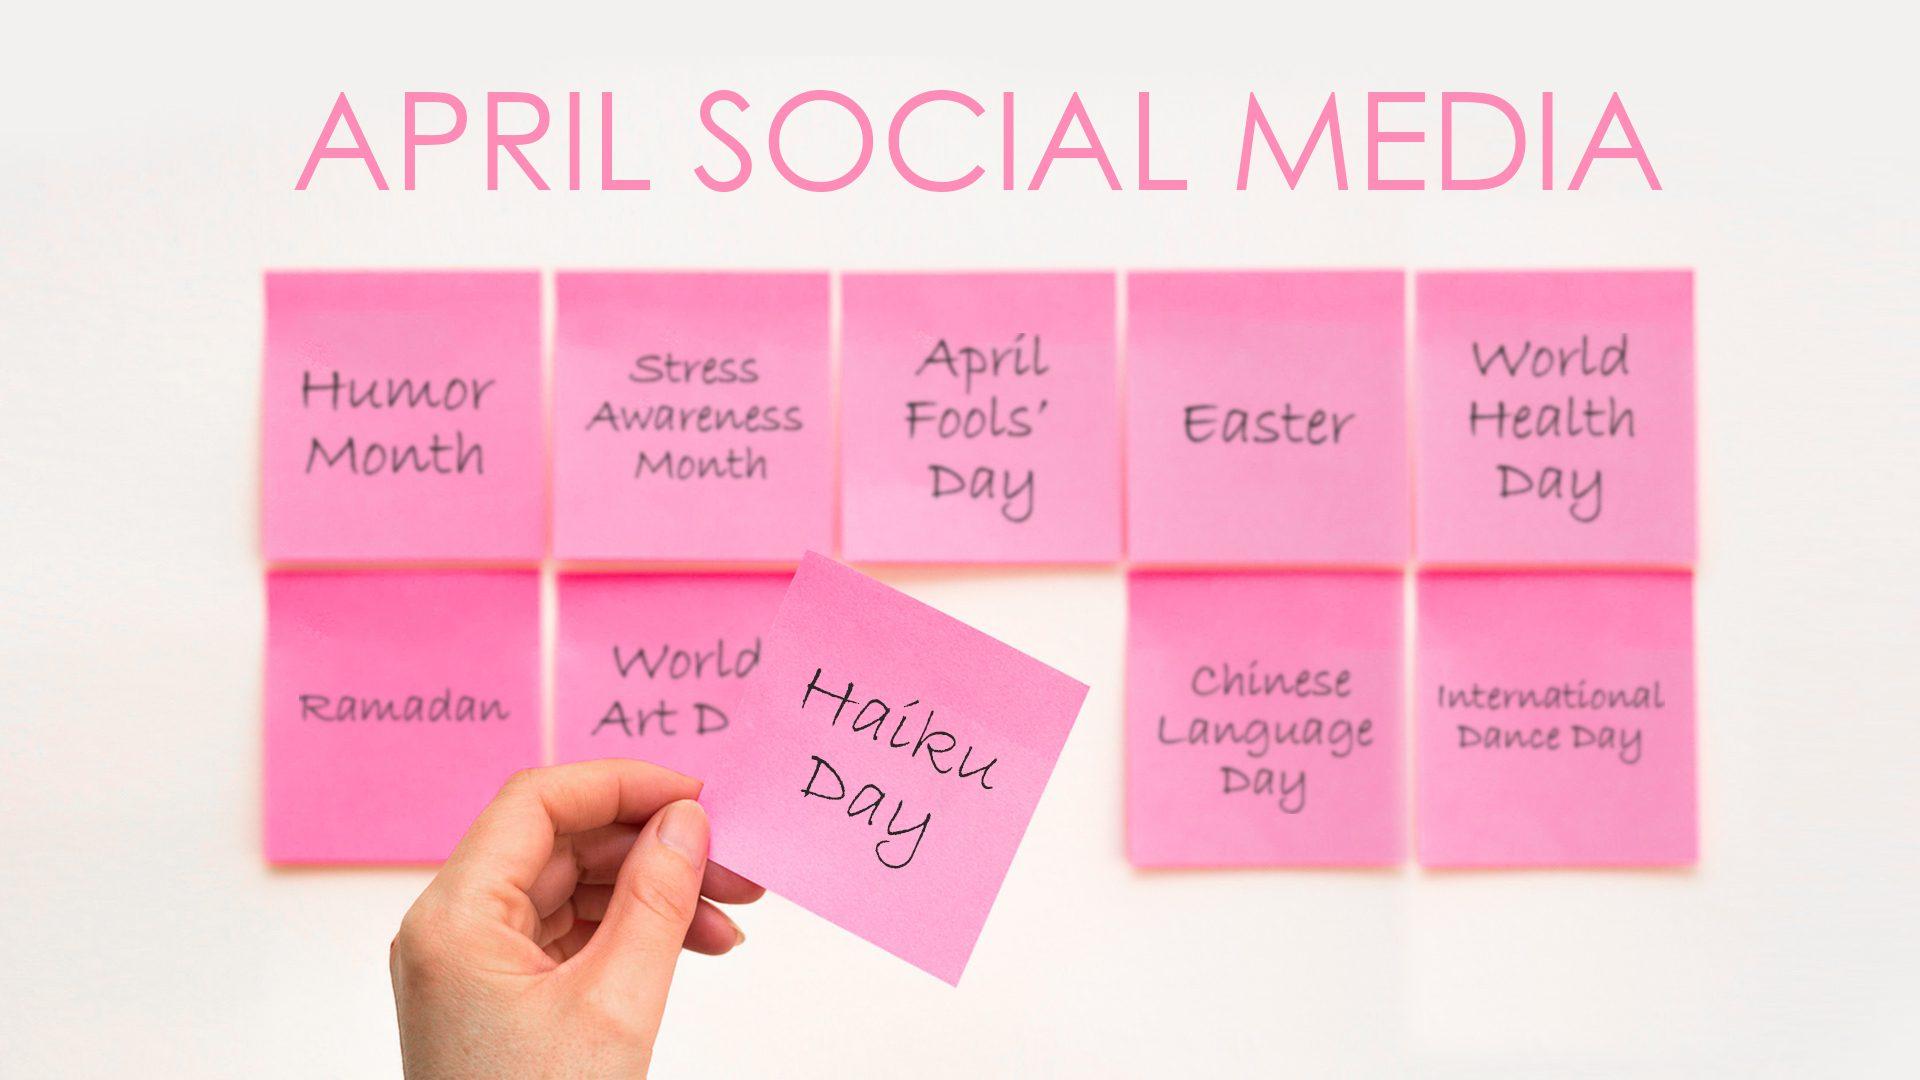 10 post ideas for social media in april cover photo